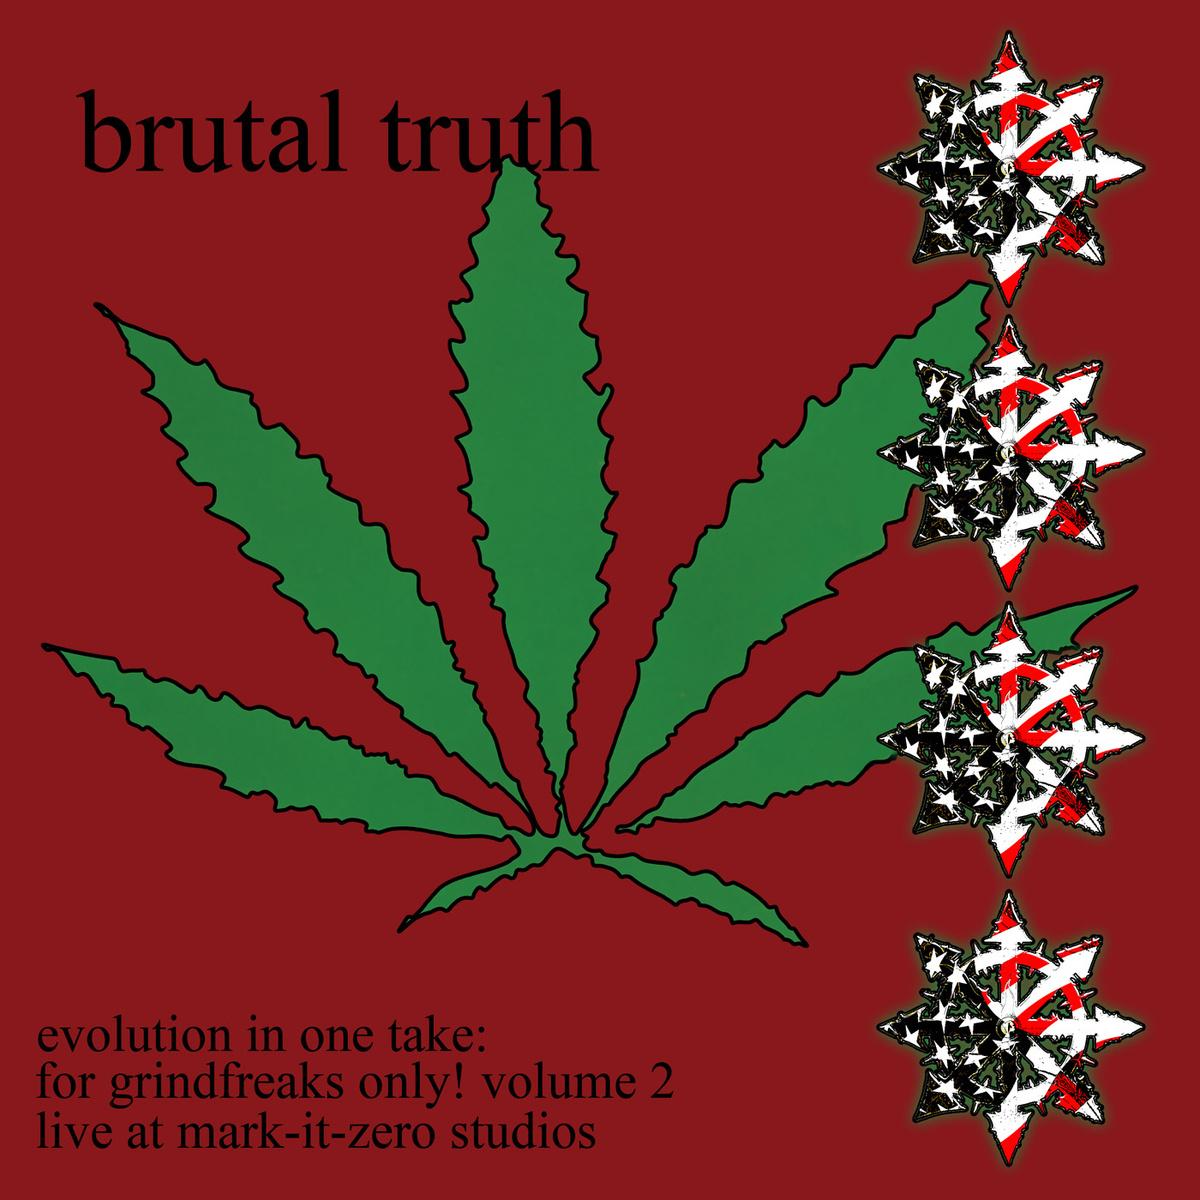 Brutal Truth - Evolution In One Take: For Grindfreaks Only! Volume 2 - 2011